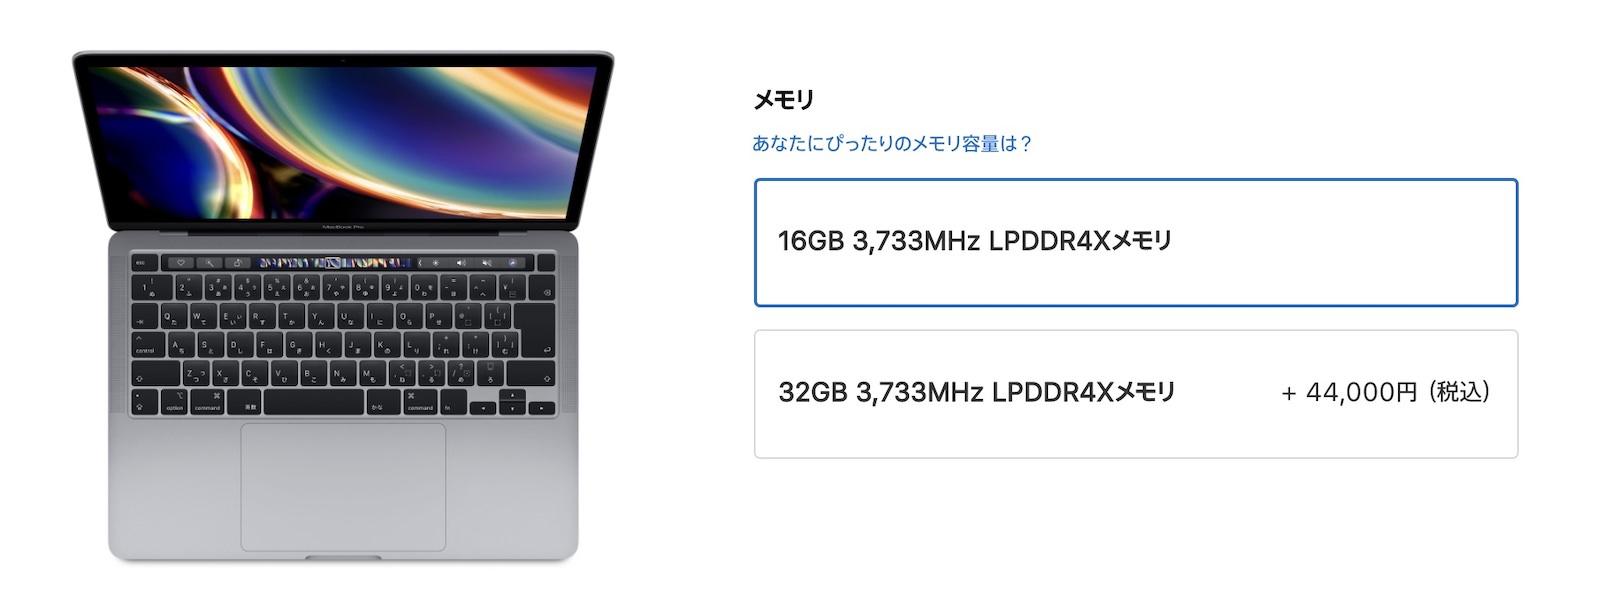 Intel 13inch macbookpro ram